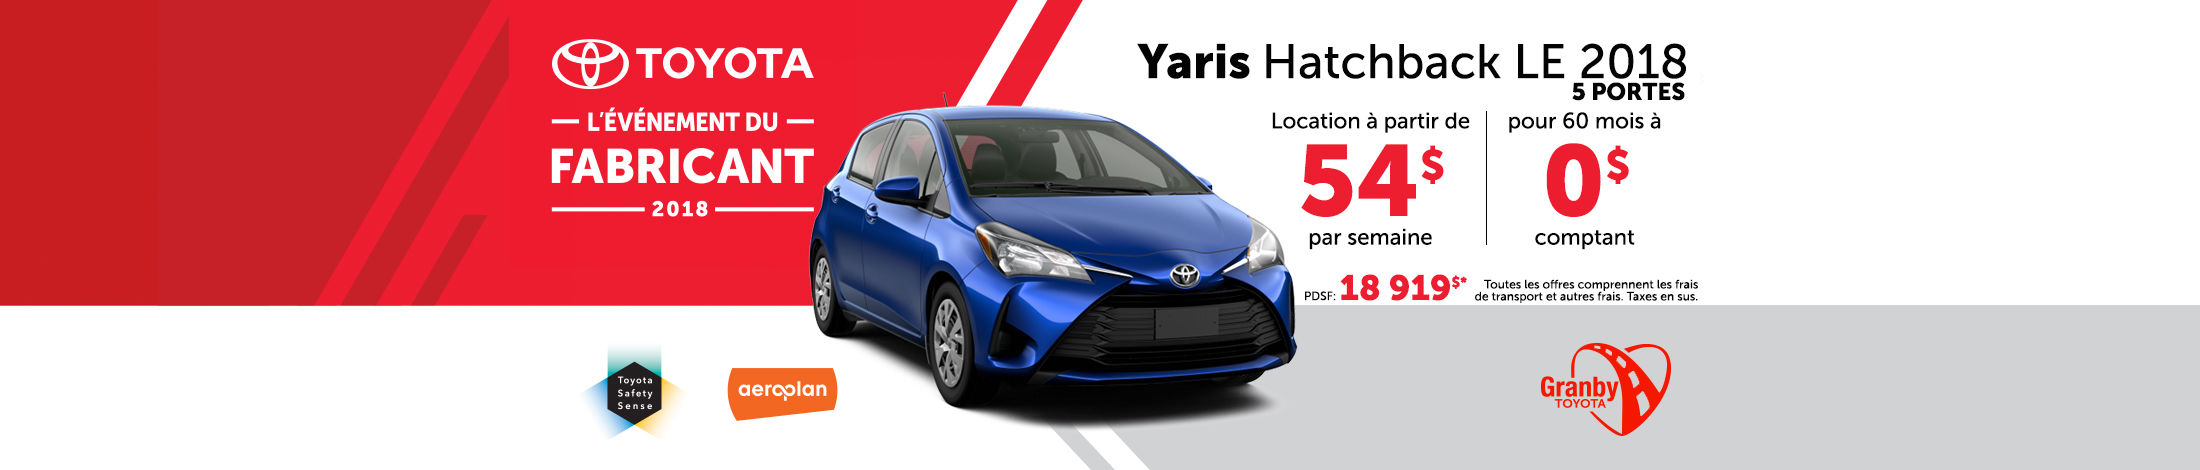 Yaris Hatchback LE 2018 promotion